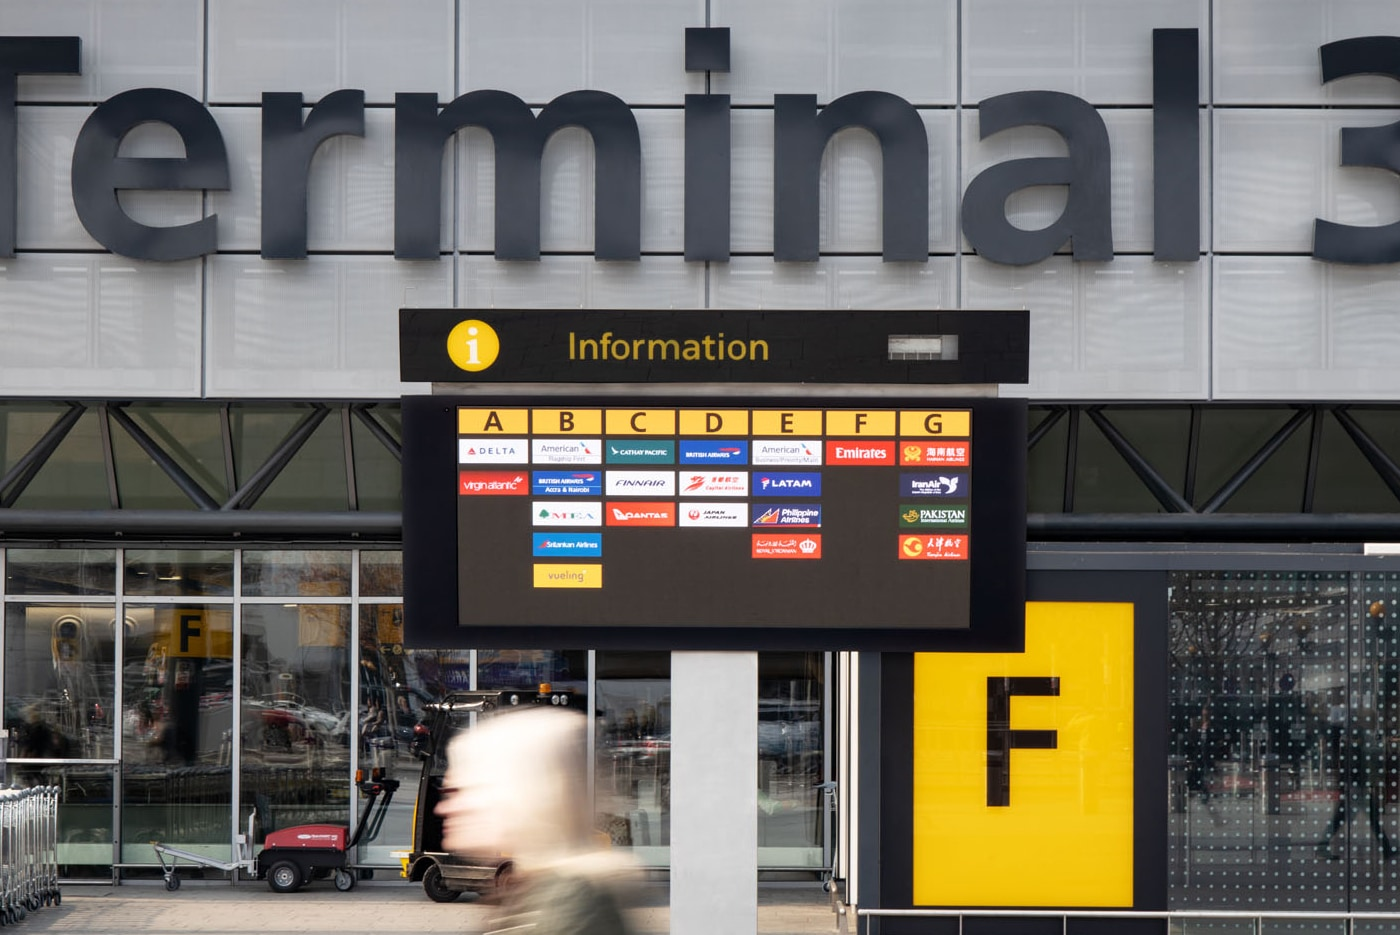 Heathrow Flight Information Displays